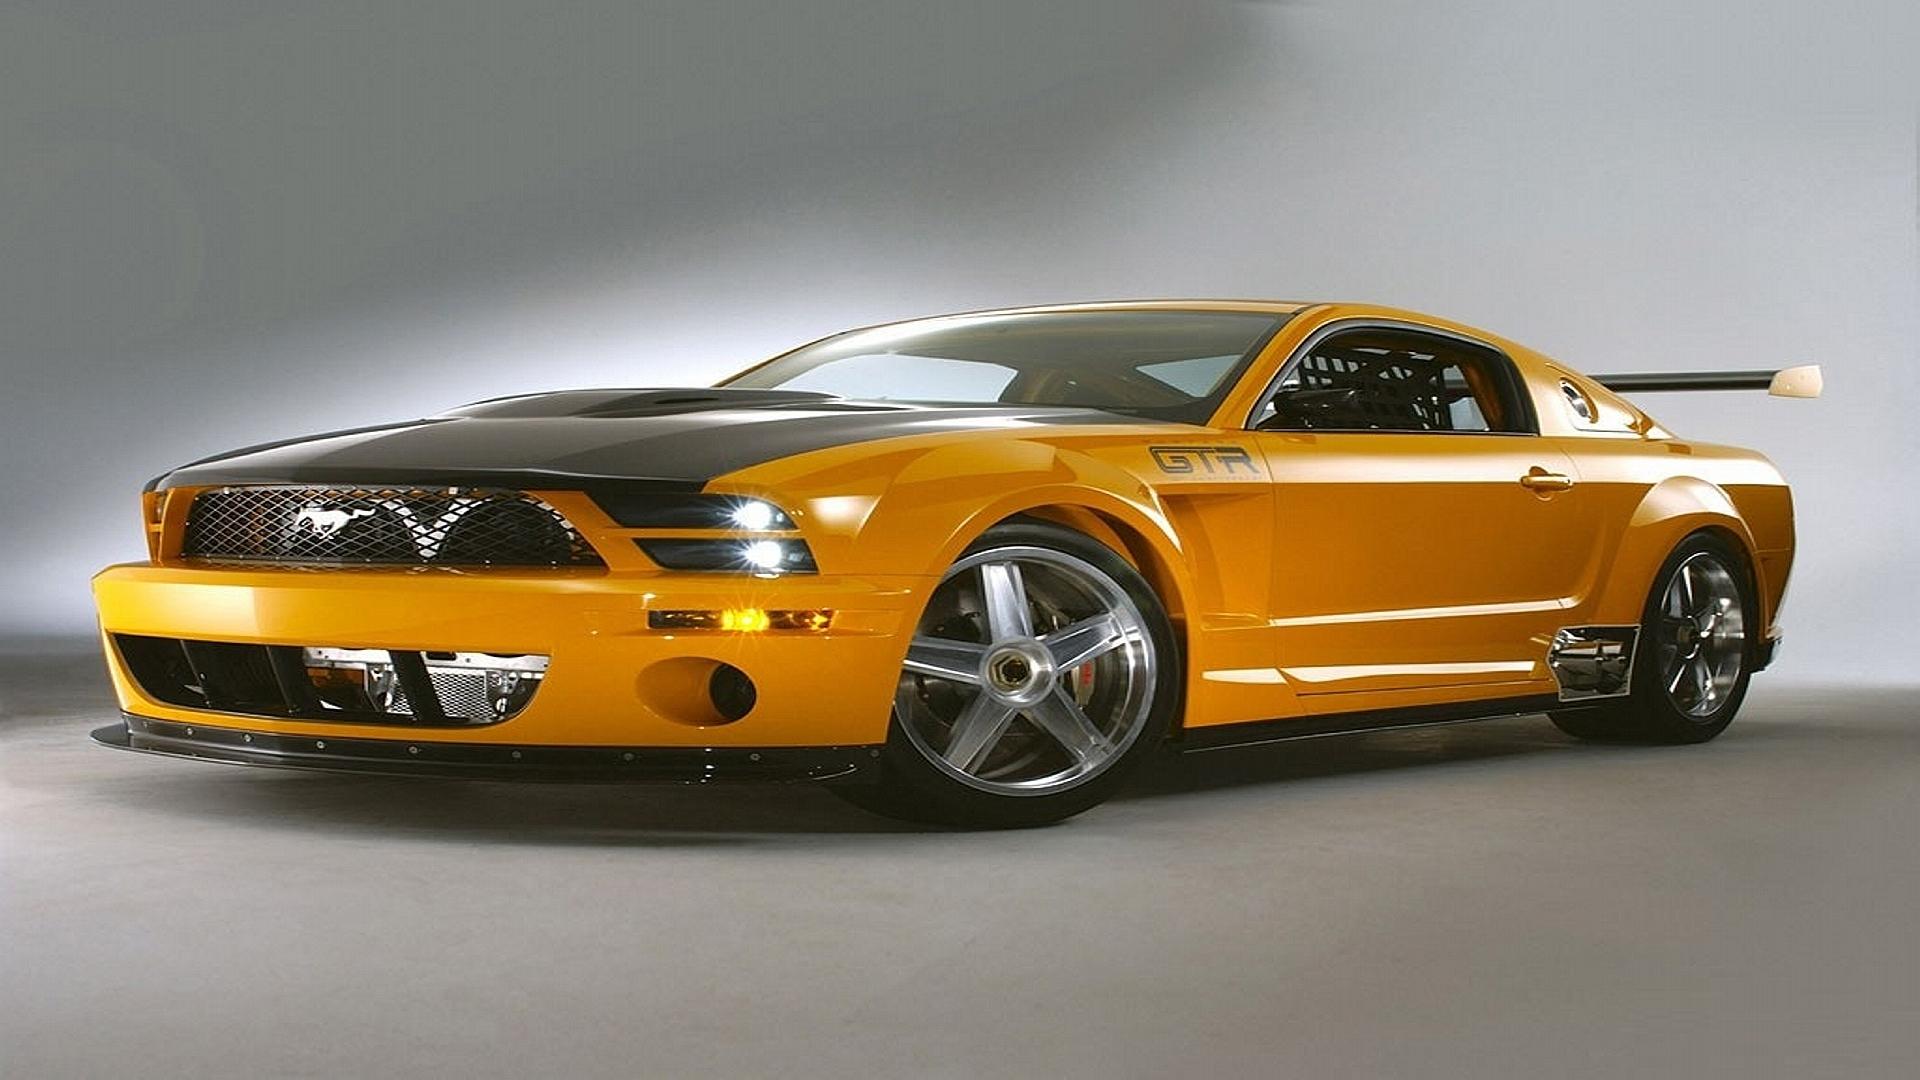 Ford Mustang GT R wallpaper 12229 1920x1080